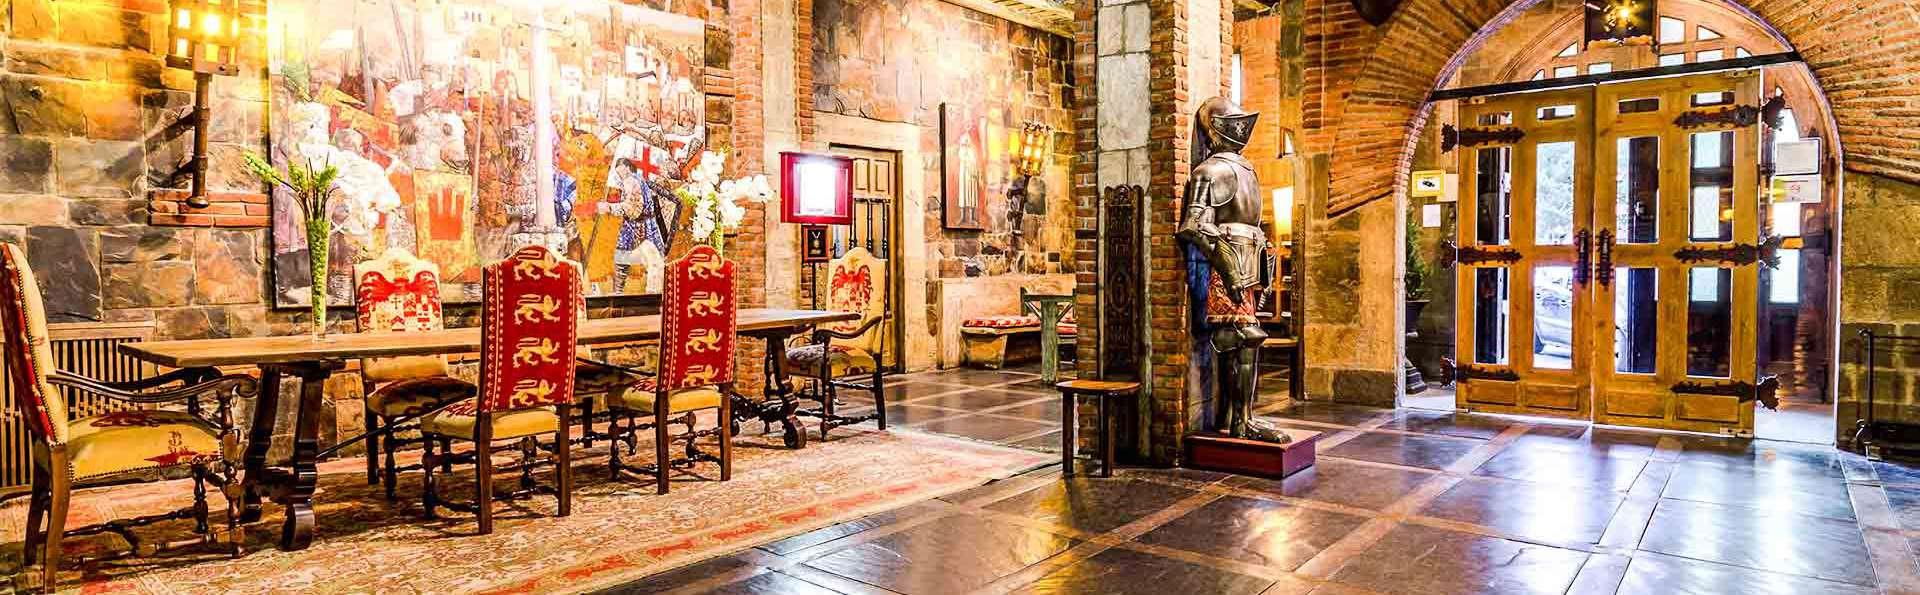 Hotel Temple Ponferrada - EDIT_HotelTemple-Lobby_16.jpg